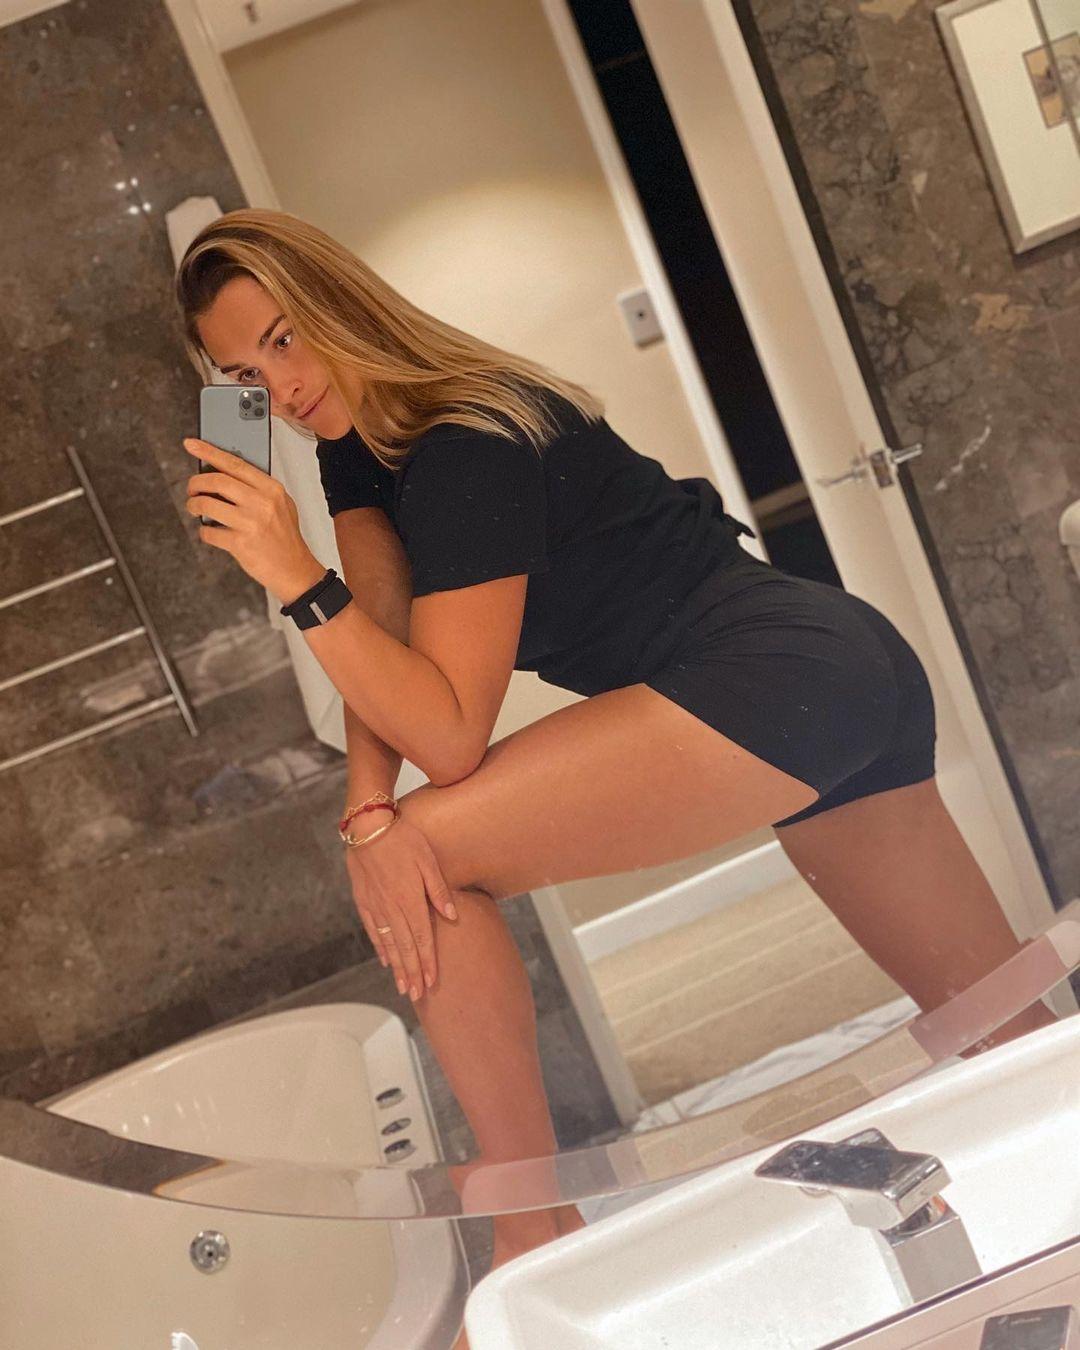 Aryna Sabalenka butt pics